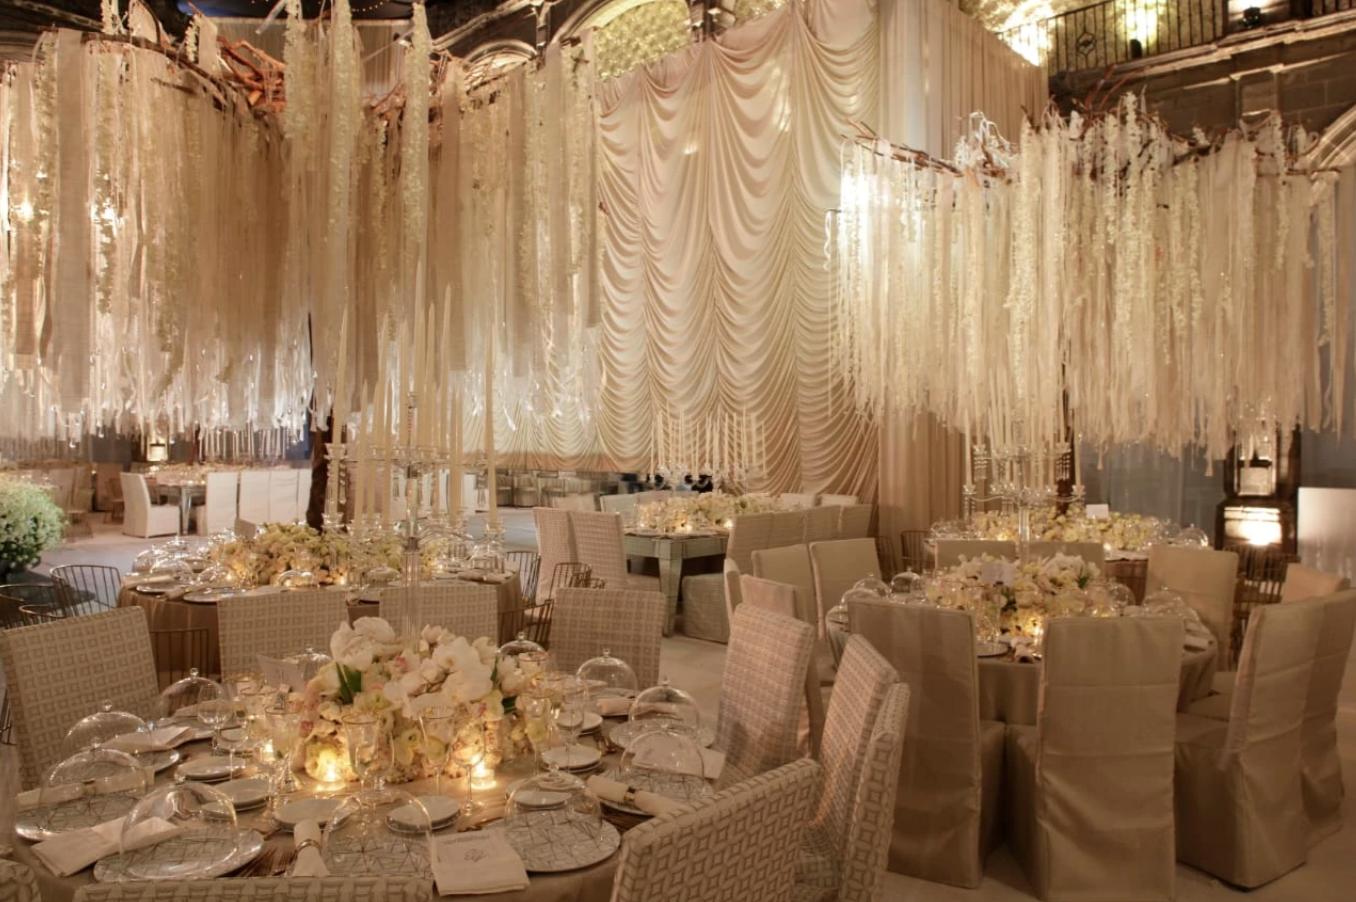 Gonzalez Helfon bodas, wedding planner en méxico, proveedores de boda exclusivos - Wedding Hub - 06